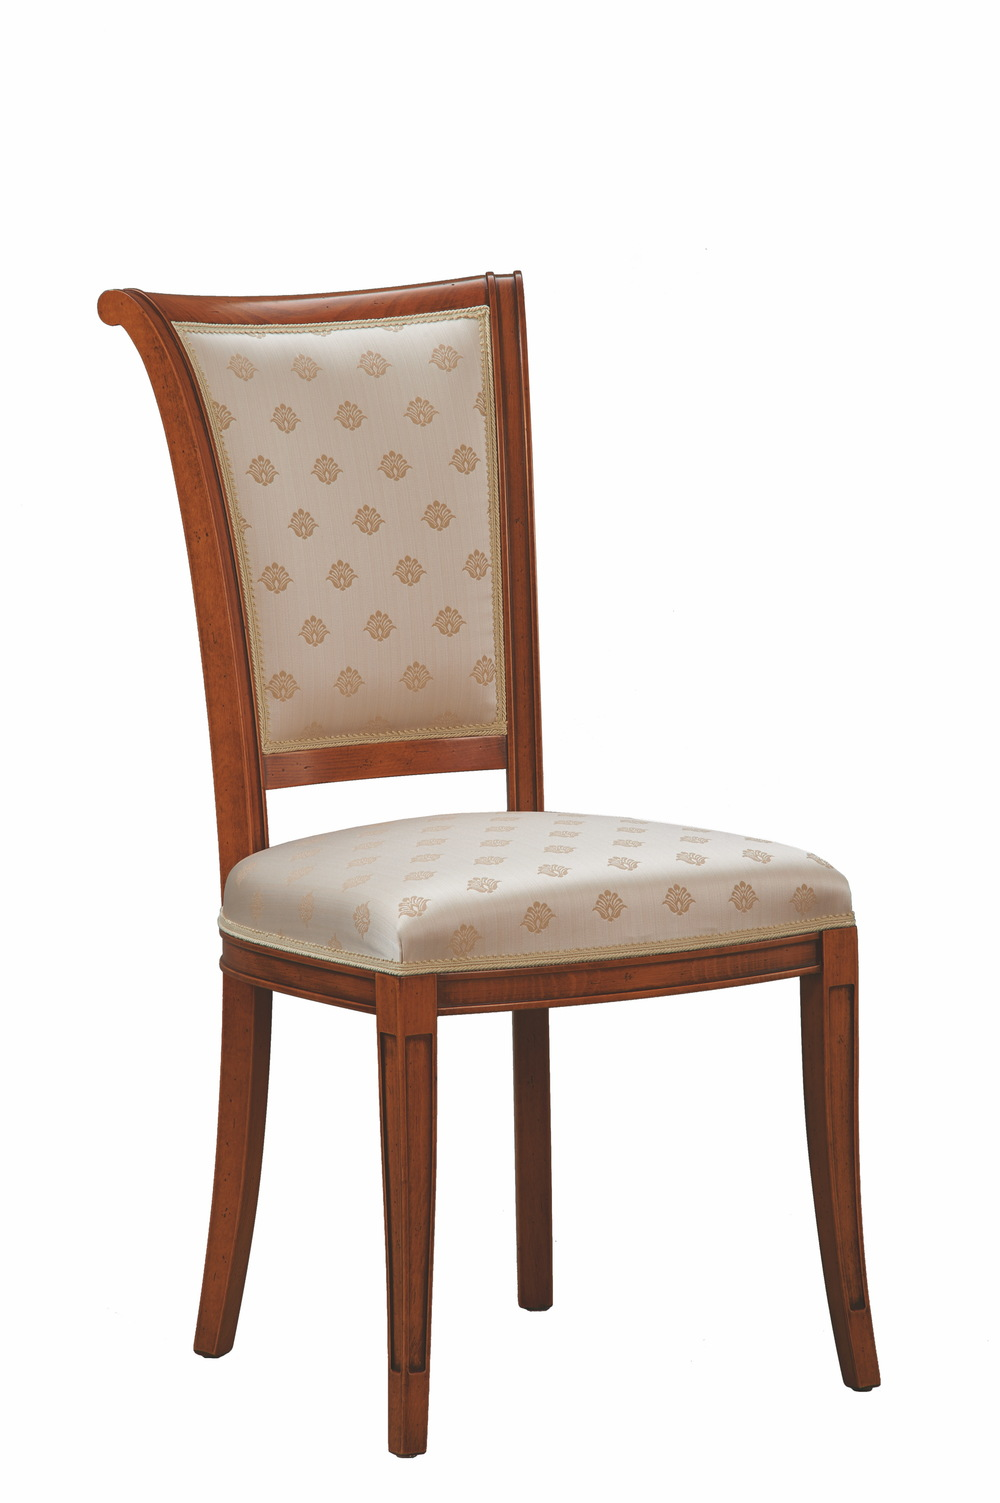 Selva - Bellagio Chair